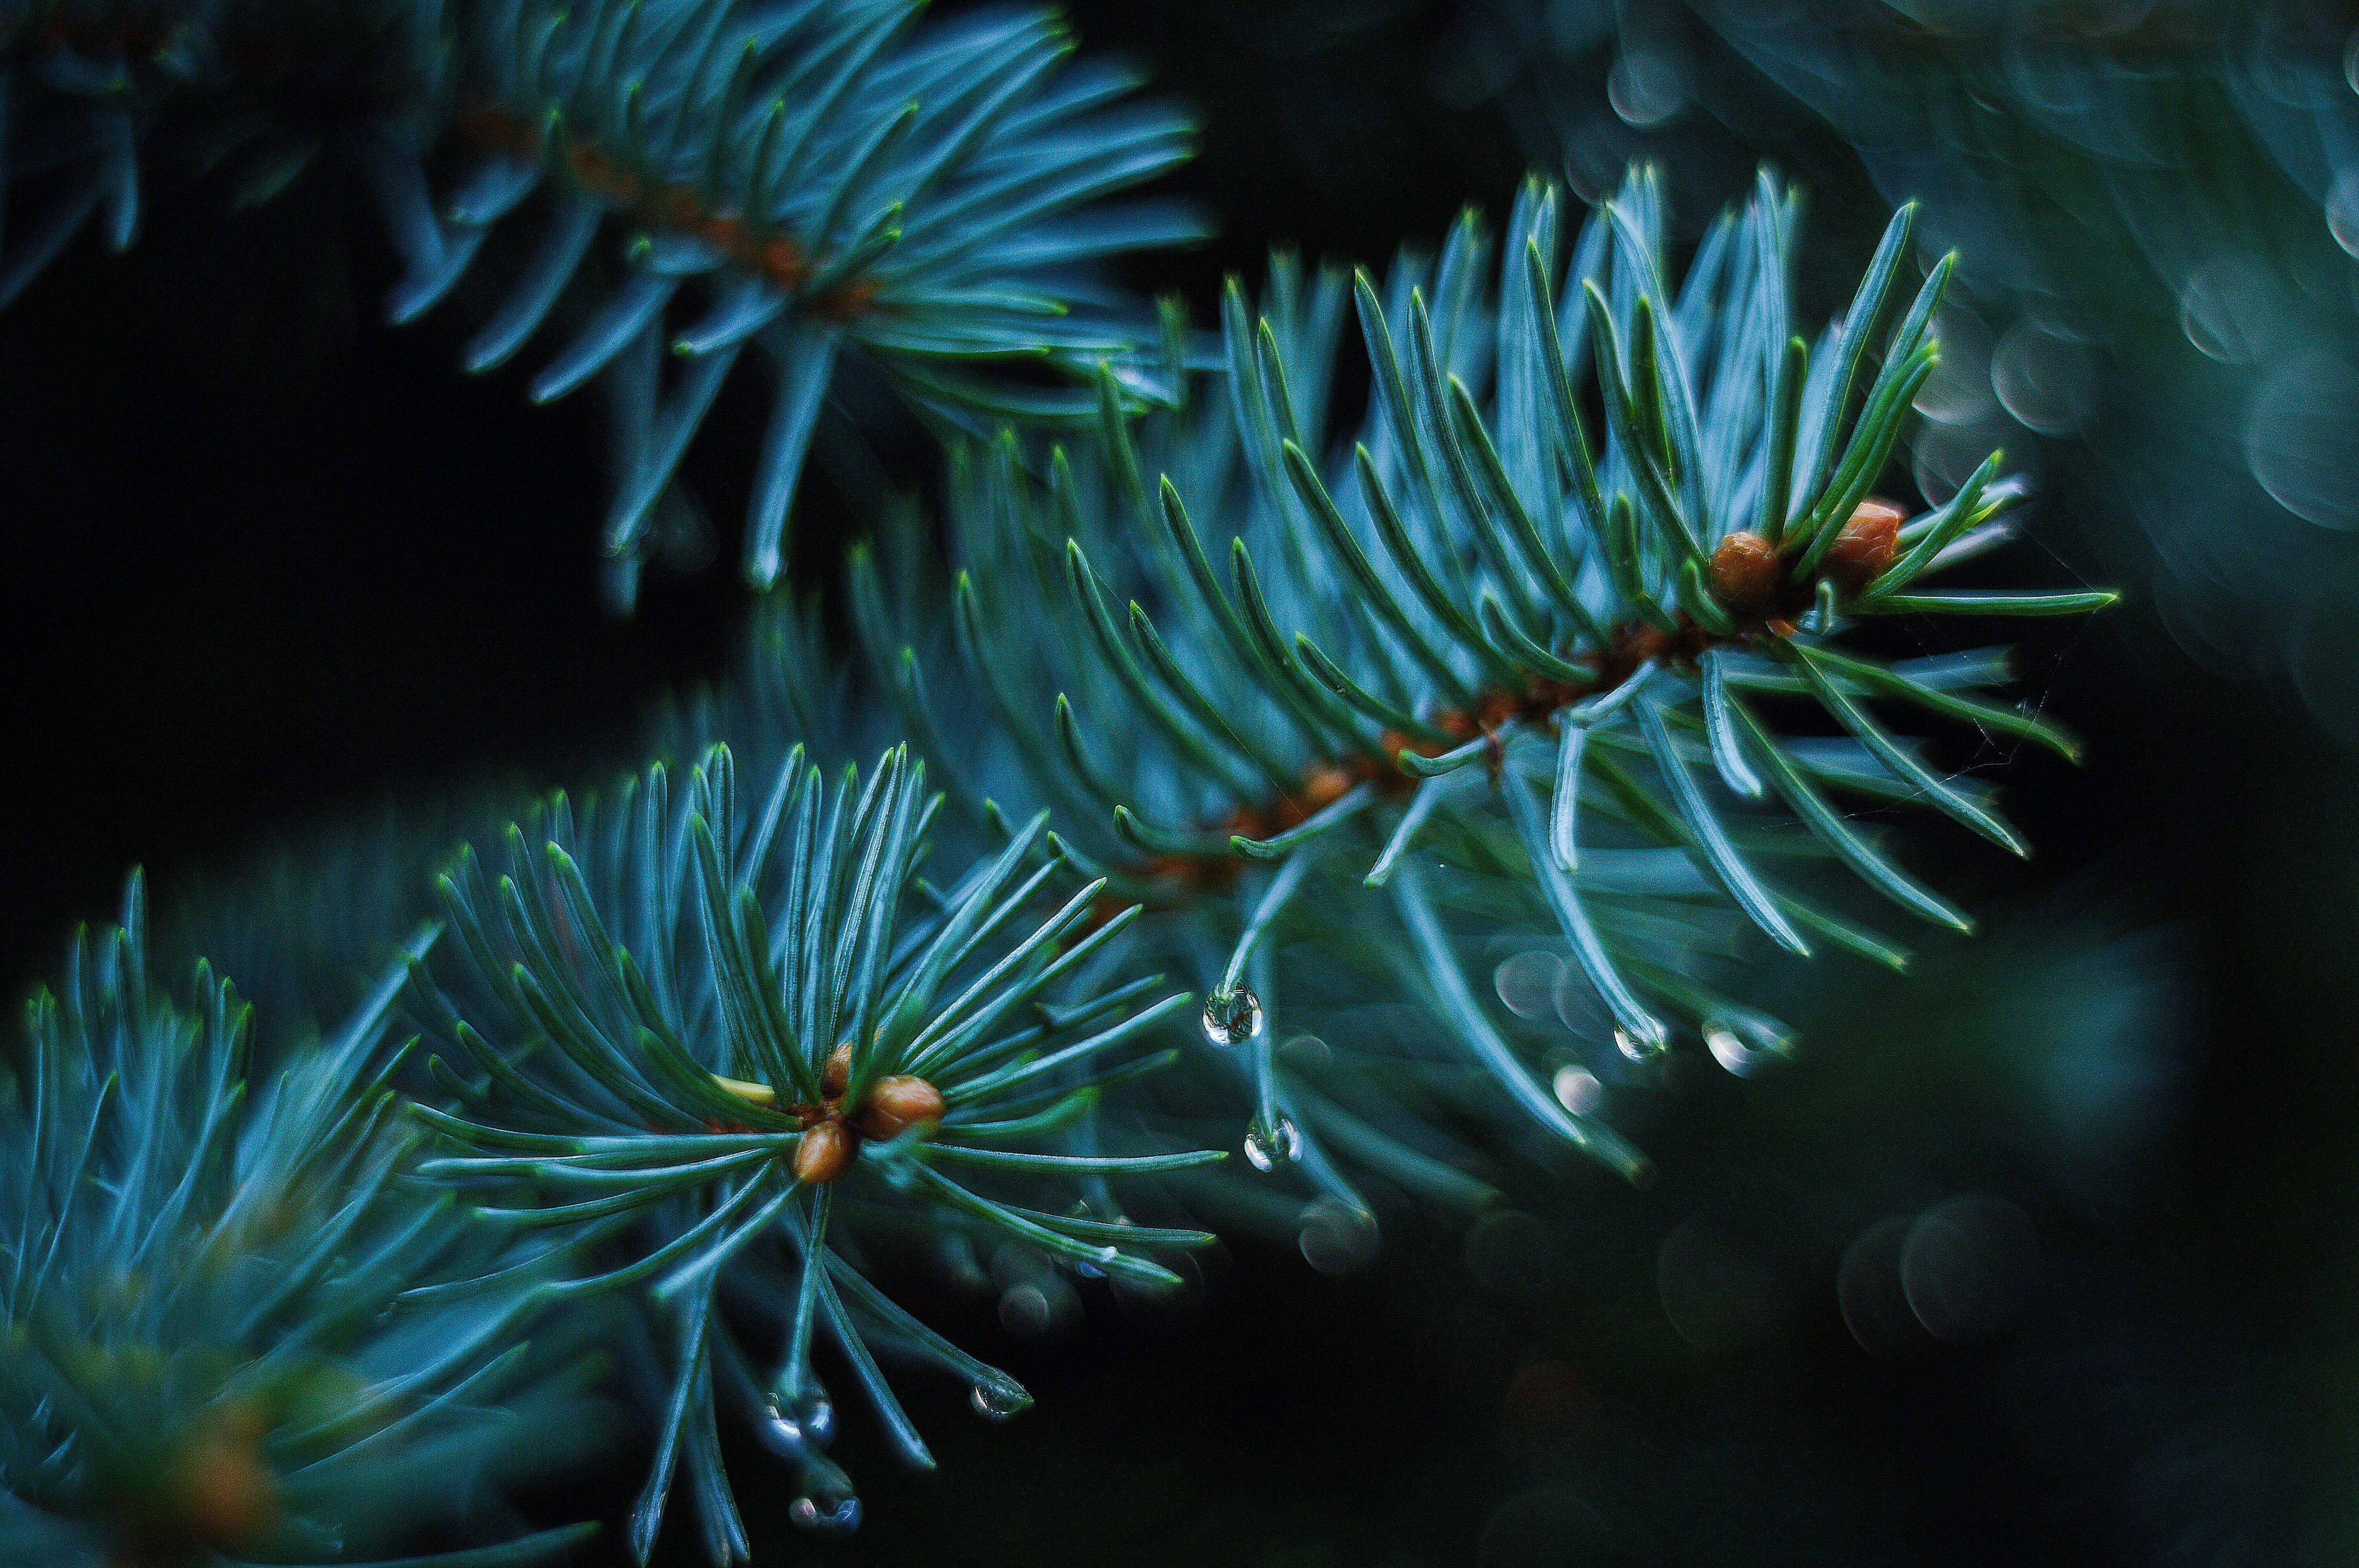 biology, blur, branches